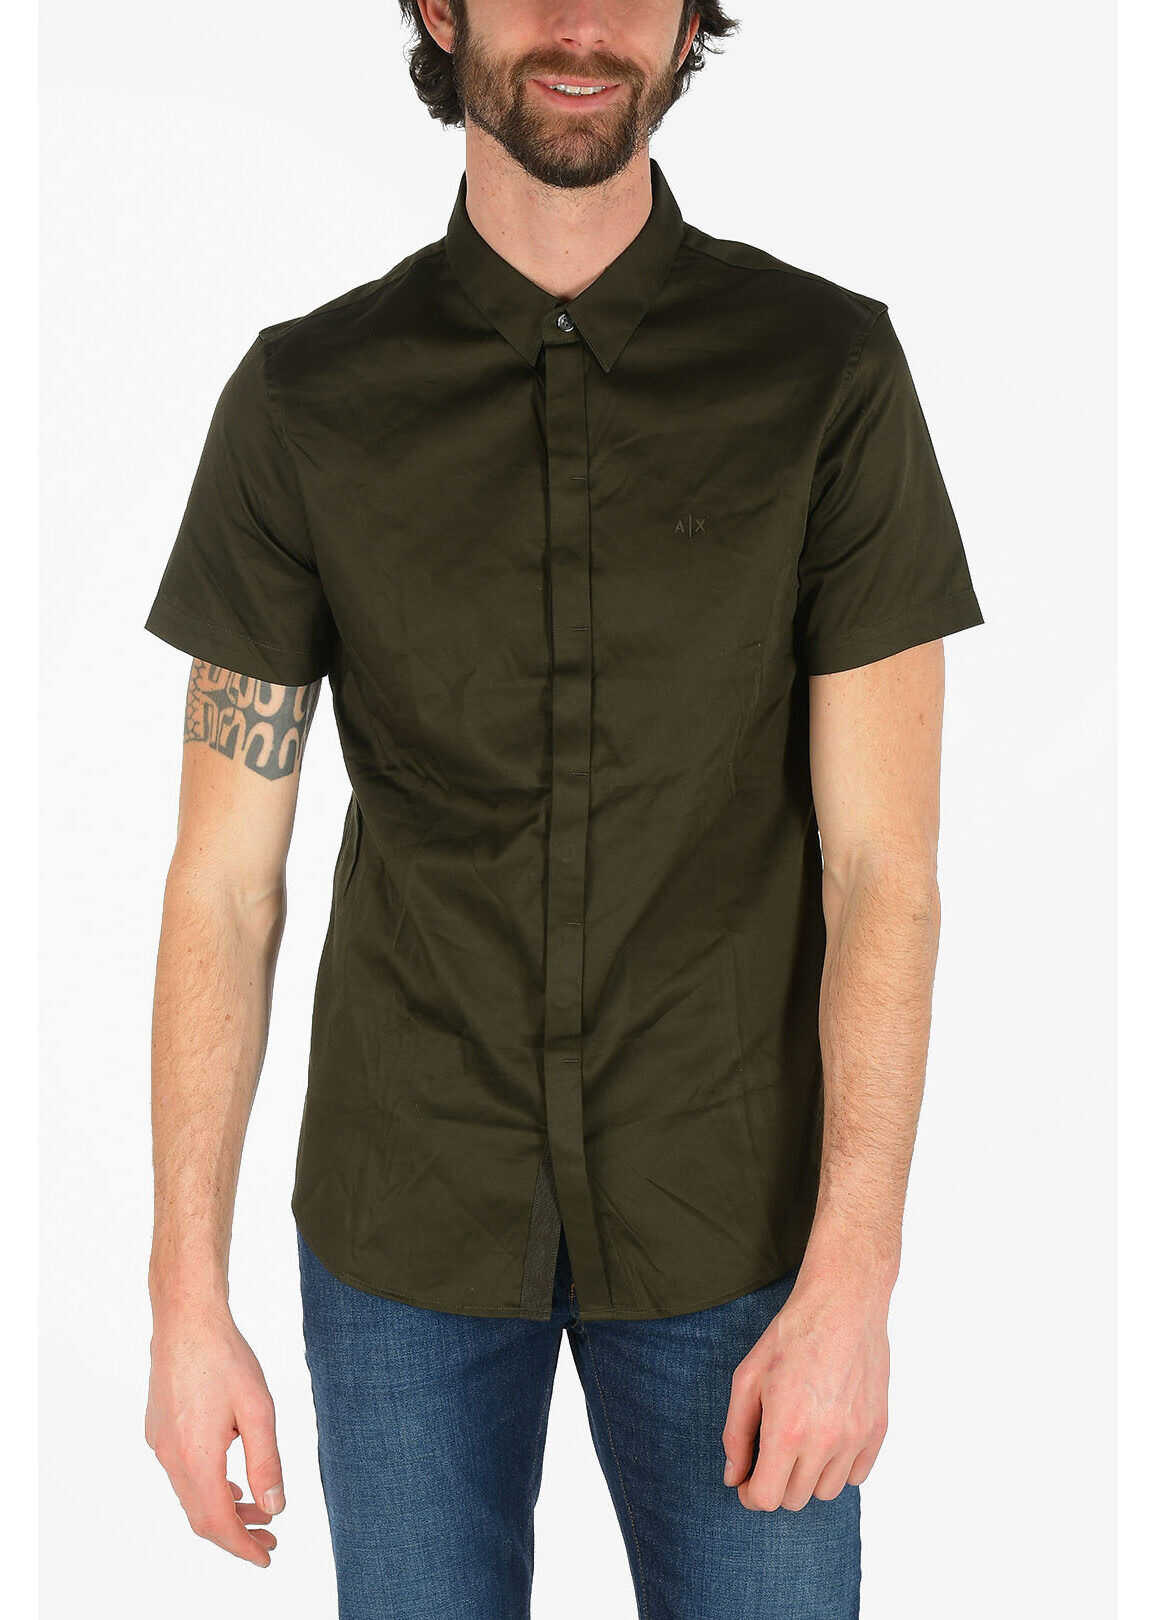 Armani ARMANI EXCHANGE Hidden Closure Short Sleeve Shirt GREEN imagine